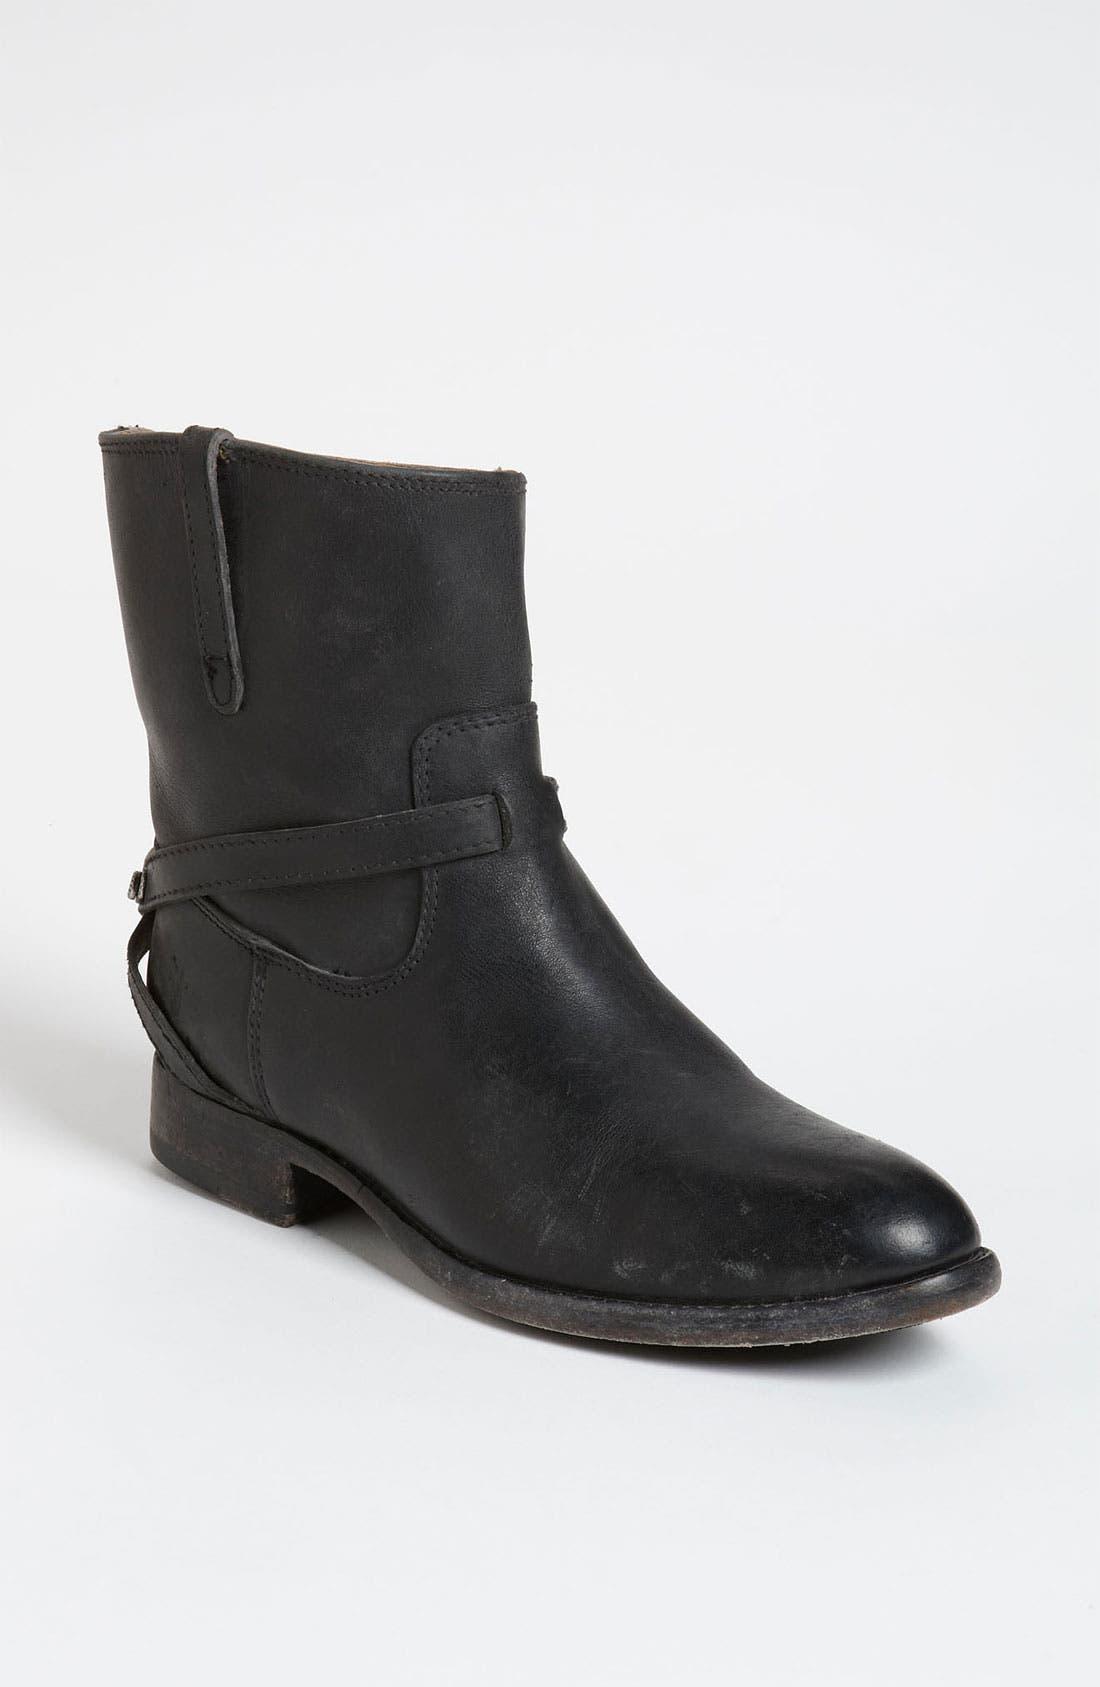 Alternate Image 1 Selected - Frye 'Lindsay Plate' Short Boot